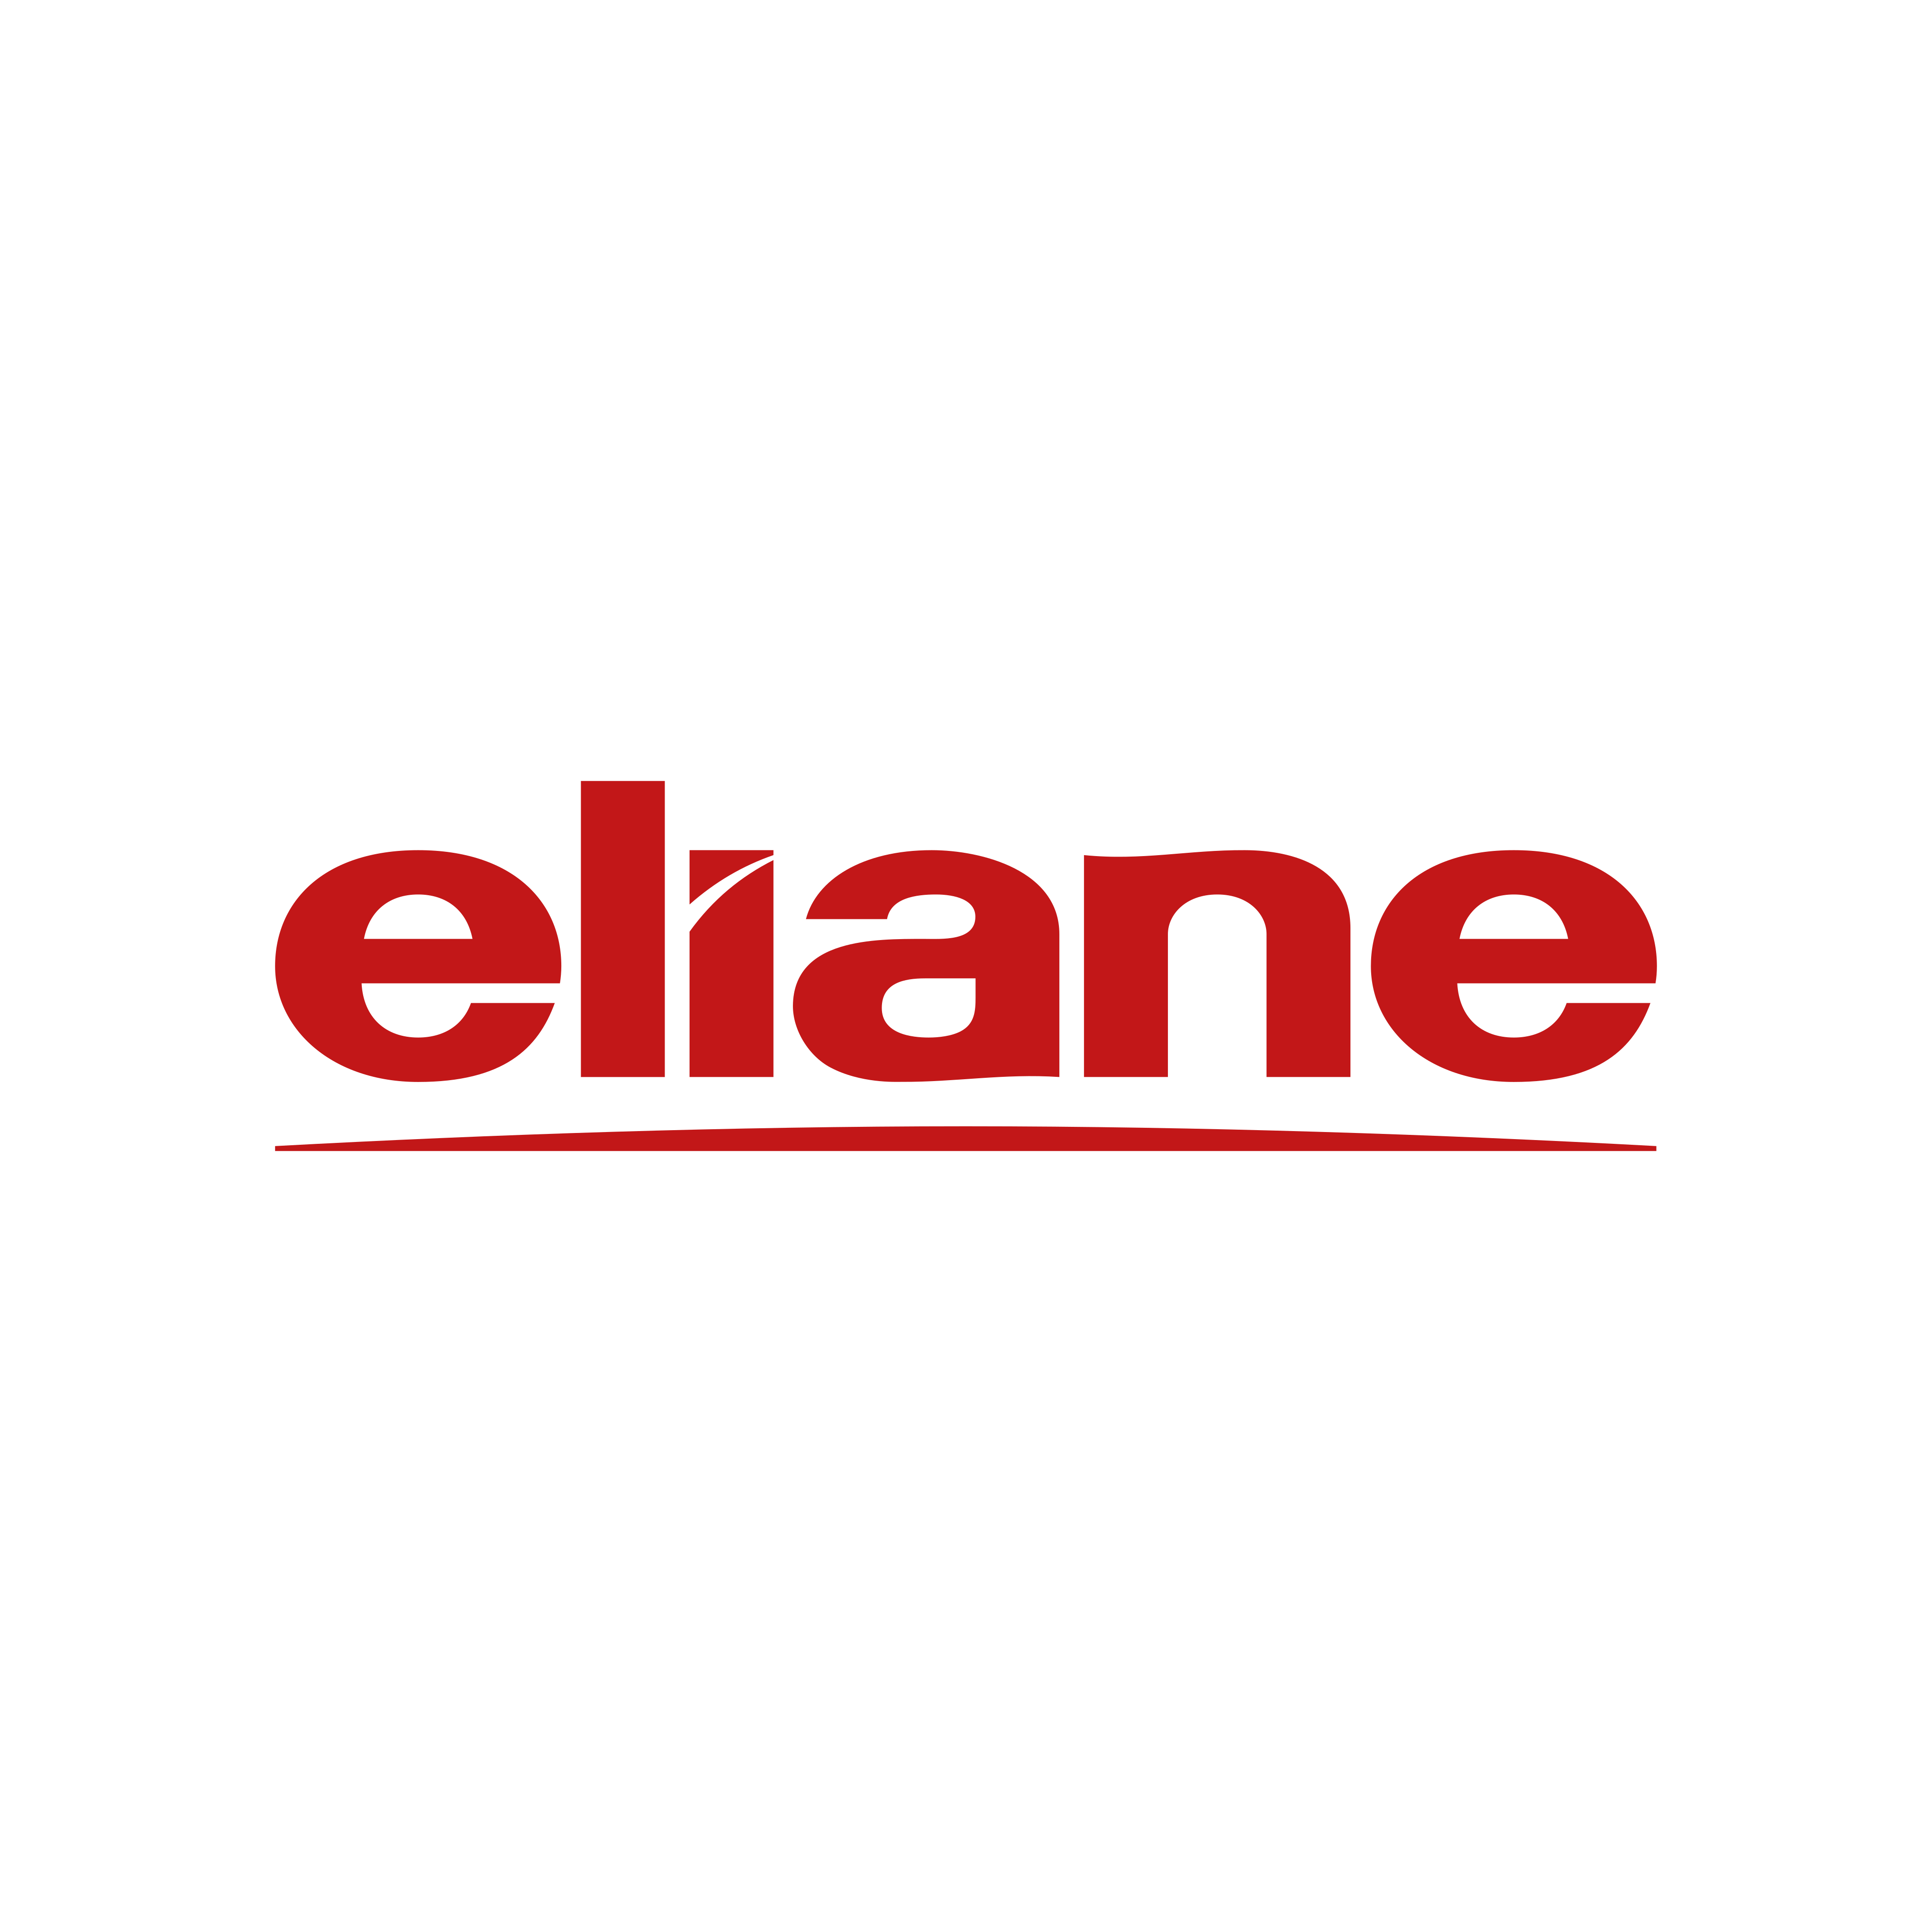 eliane logo 0 - Eliane Logo